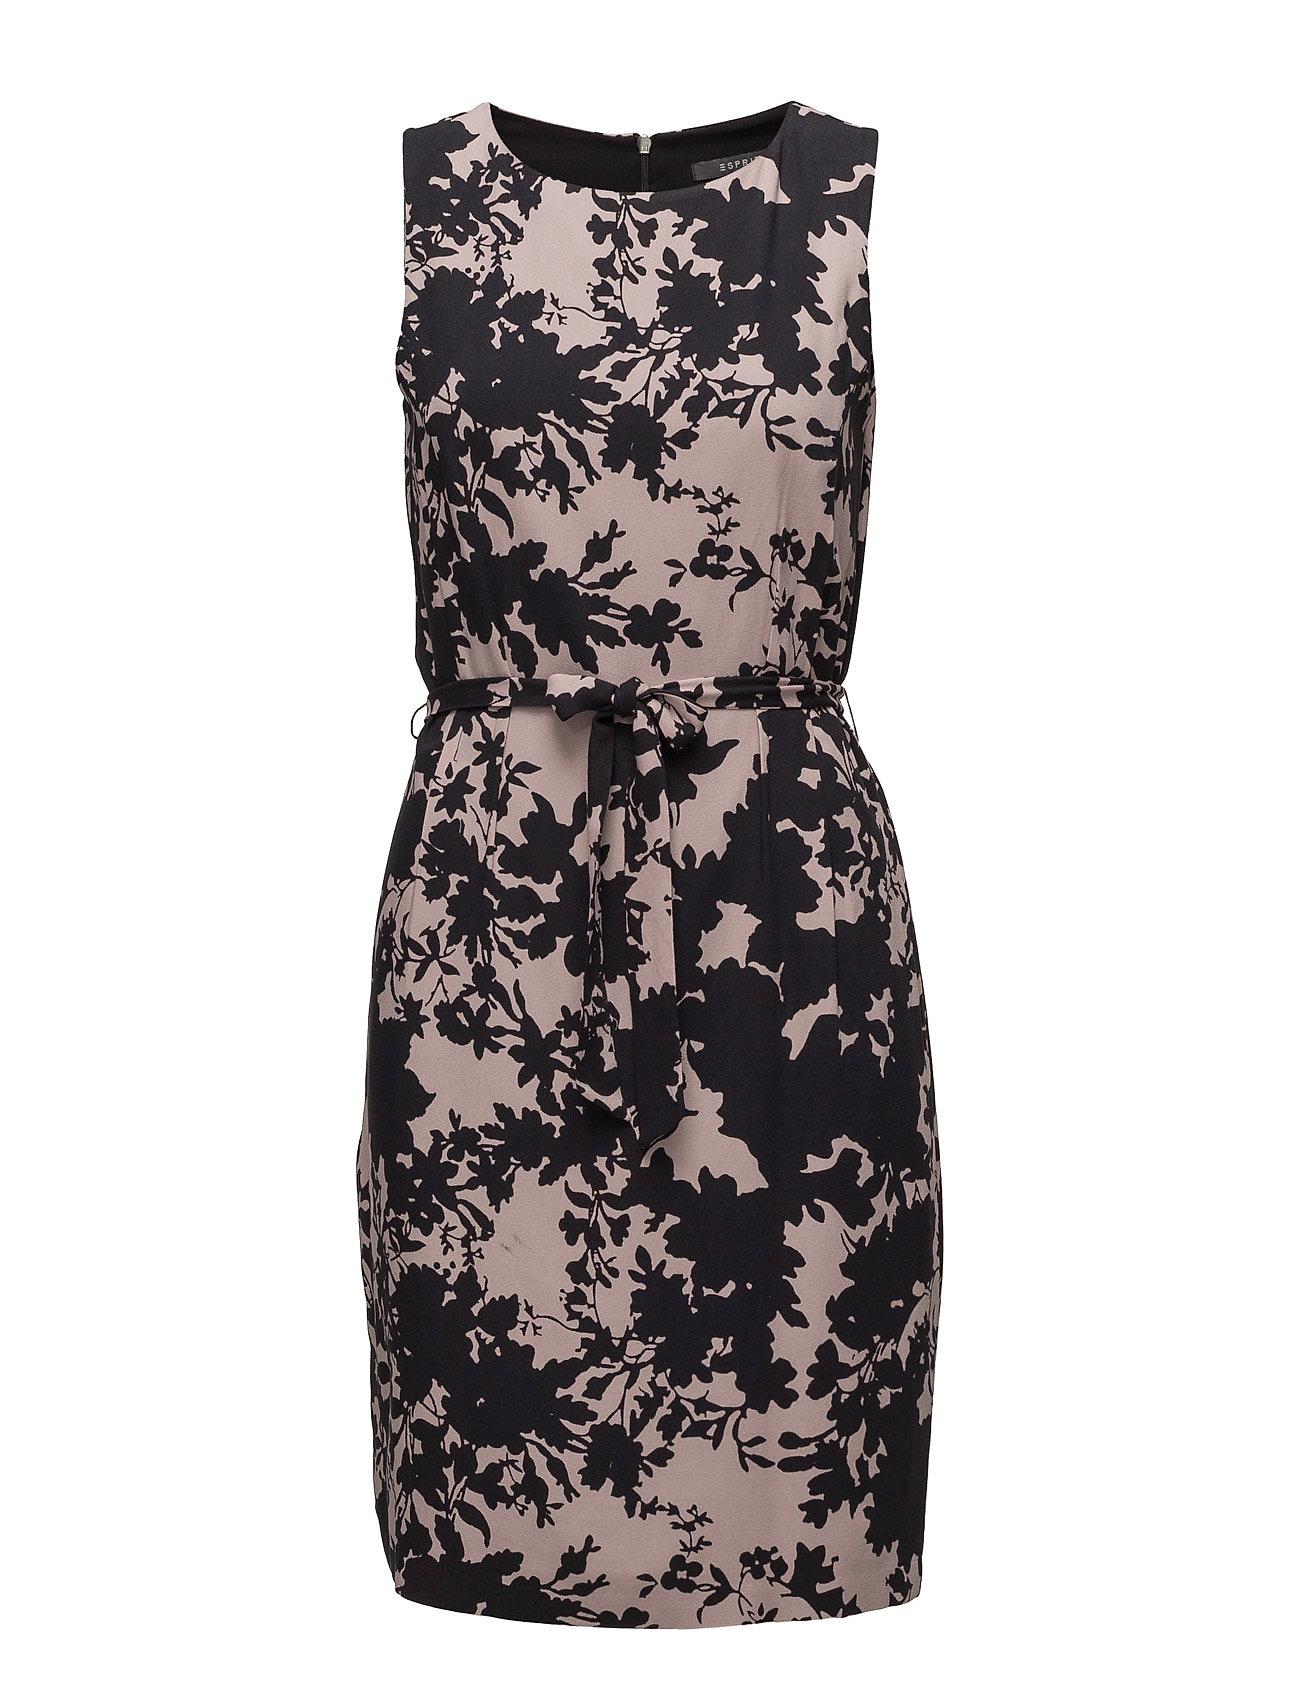 Dresses Light Woven Esprit Collection Korte kjoler til Damer i Nøgen